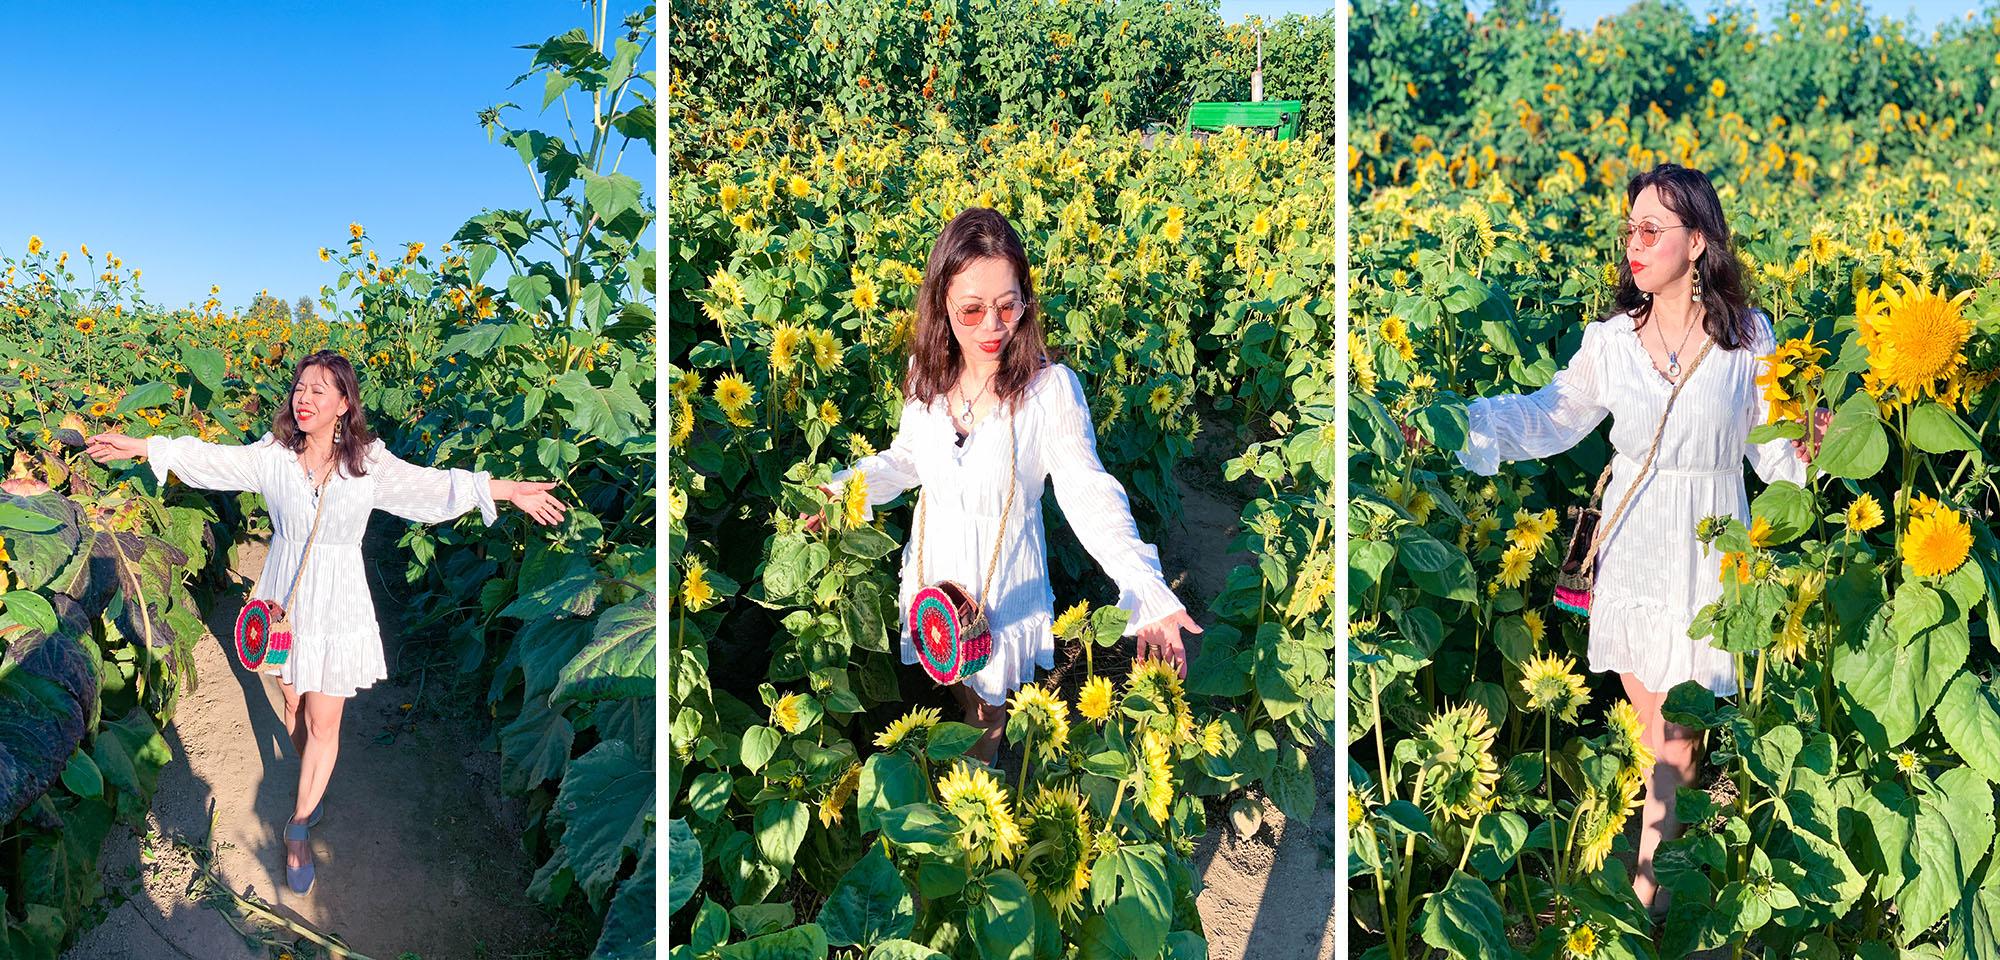 What to wear in Sunflower farm